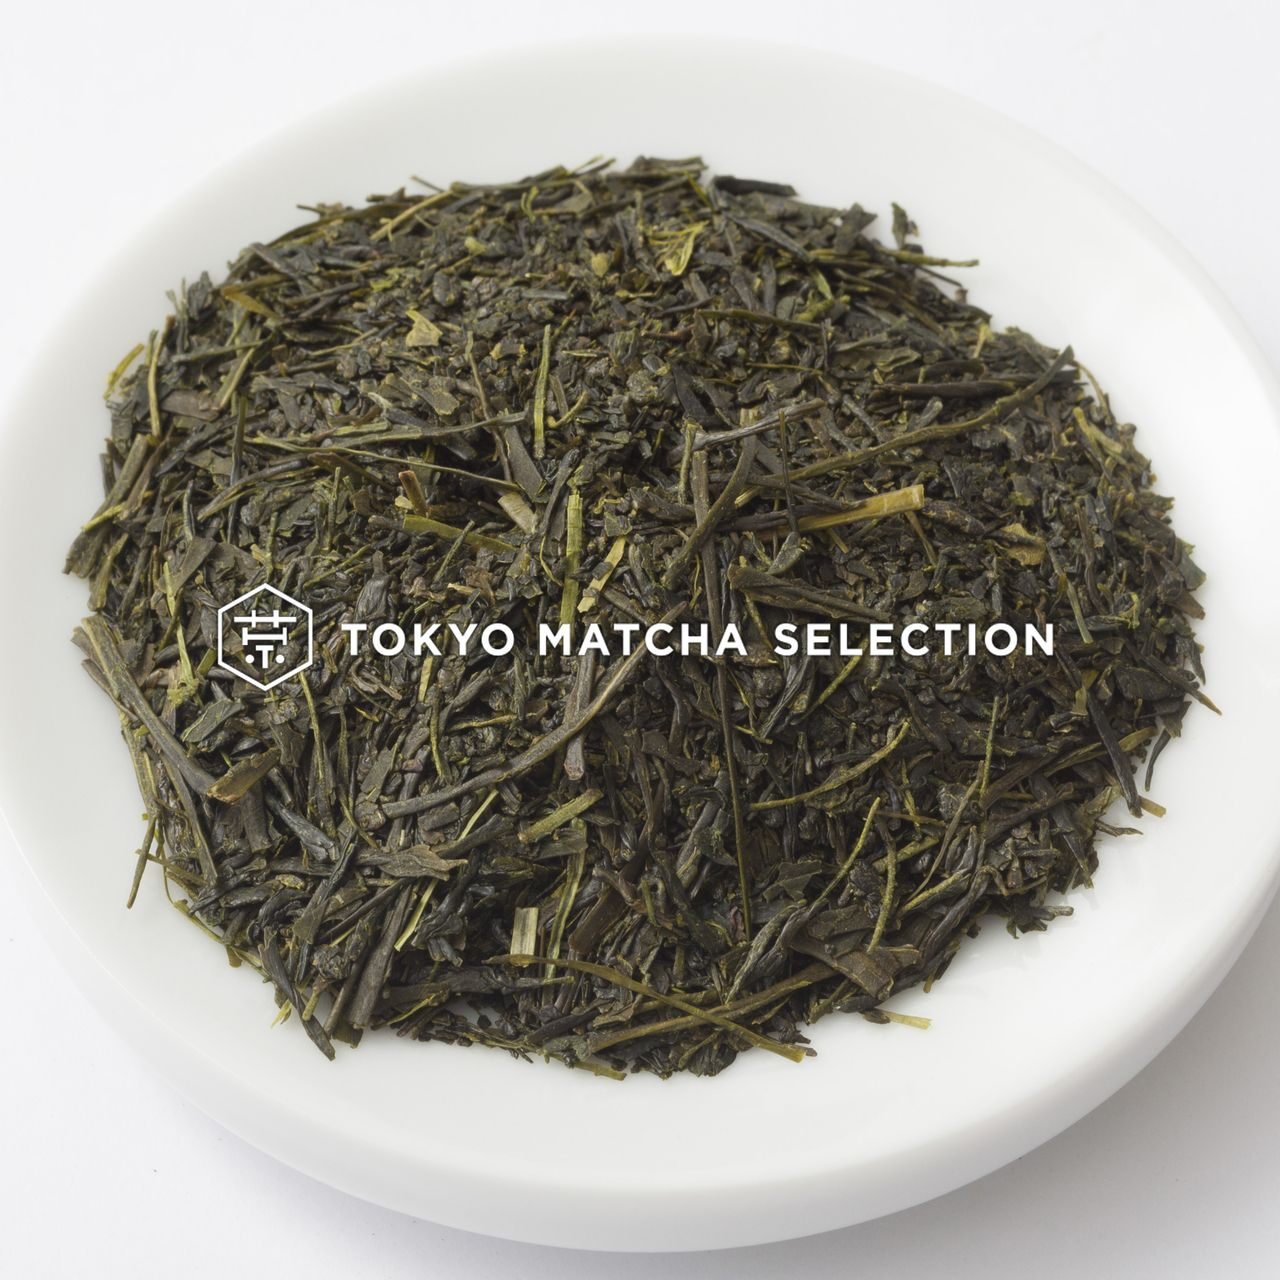 Tokyo matcha selection tea wholesale chakouan ureshino gyokuro - Tokyo Matcha Selection Jas Certified Organic Mountain Grown Fukamushi Yabukita Sencha Green Tea 100g 3 52oz 35 99 Http Www Tokyo Matcha